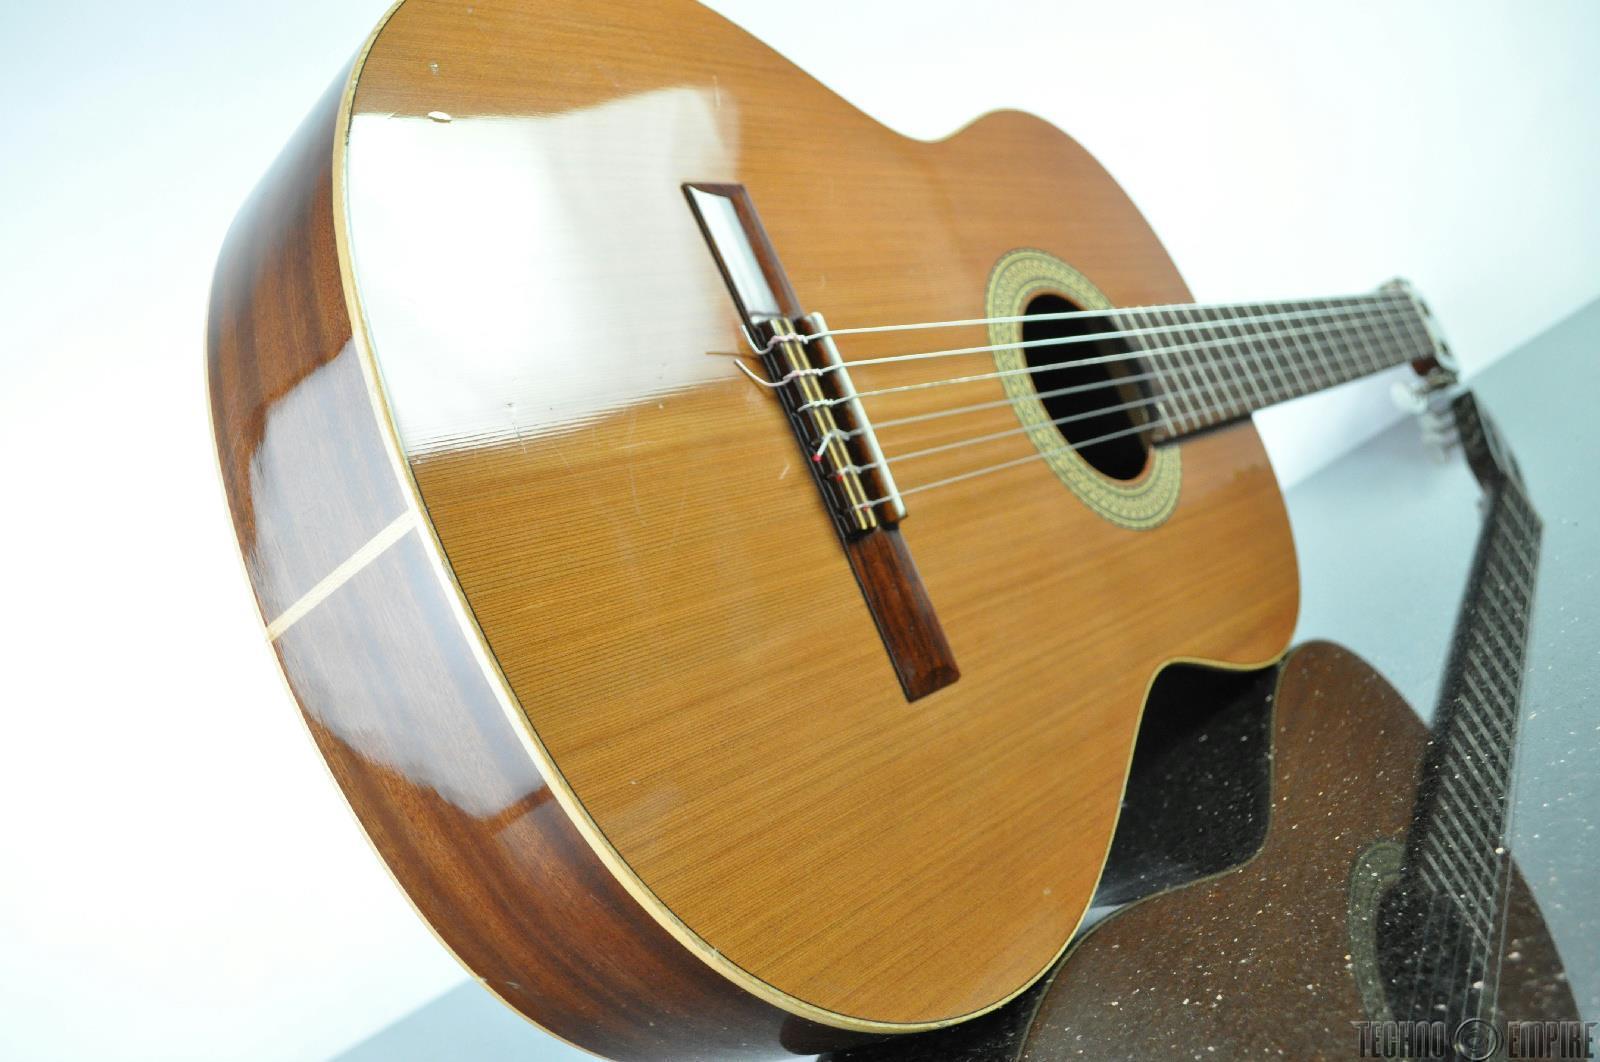 ignacio m rozas modelo no 2 classical nylon string acoustic guitar 16625 ebay. Black Bedroom Furniture Sets. Home Design Ideas